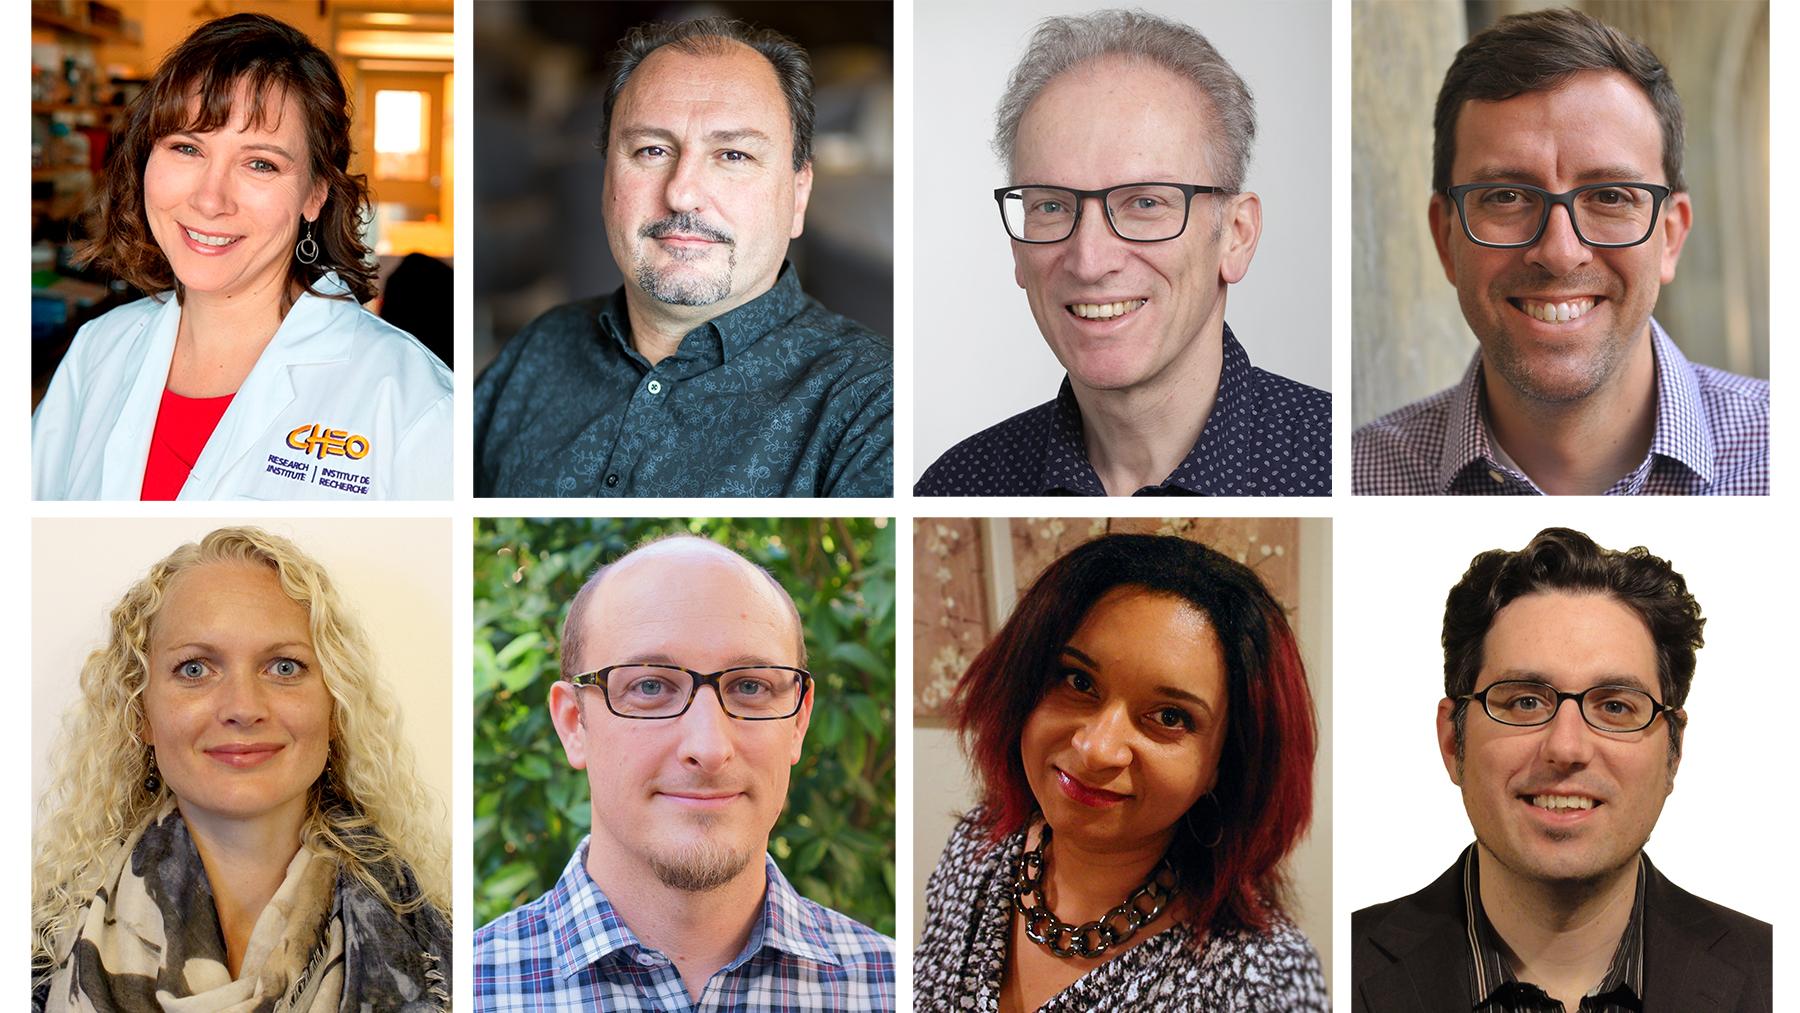 Kym Boycott, Lionel Briand, Hans Lochmüller, Jason Millar, Maria Musgaard, Brett Walker, Monnica Williams and Jeff Lundeen